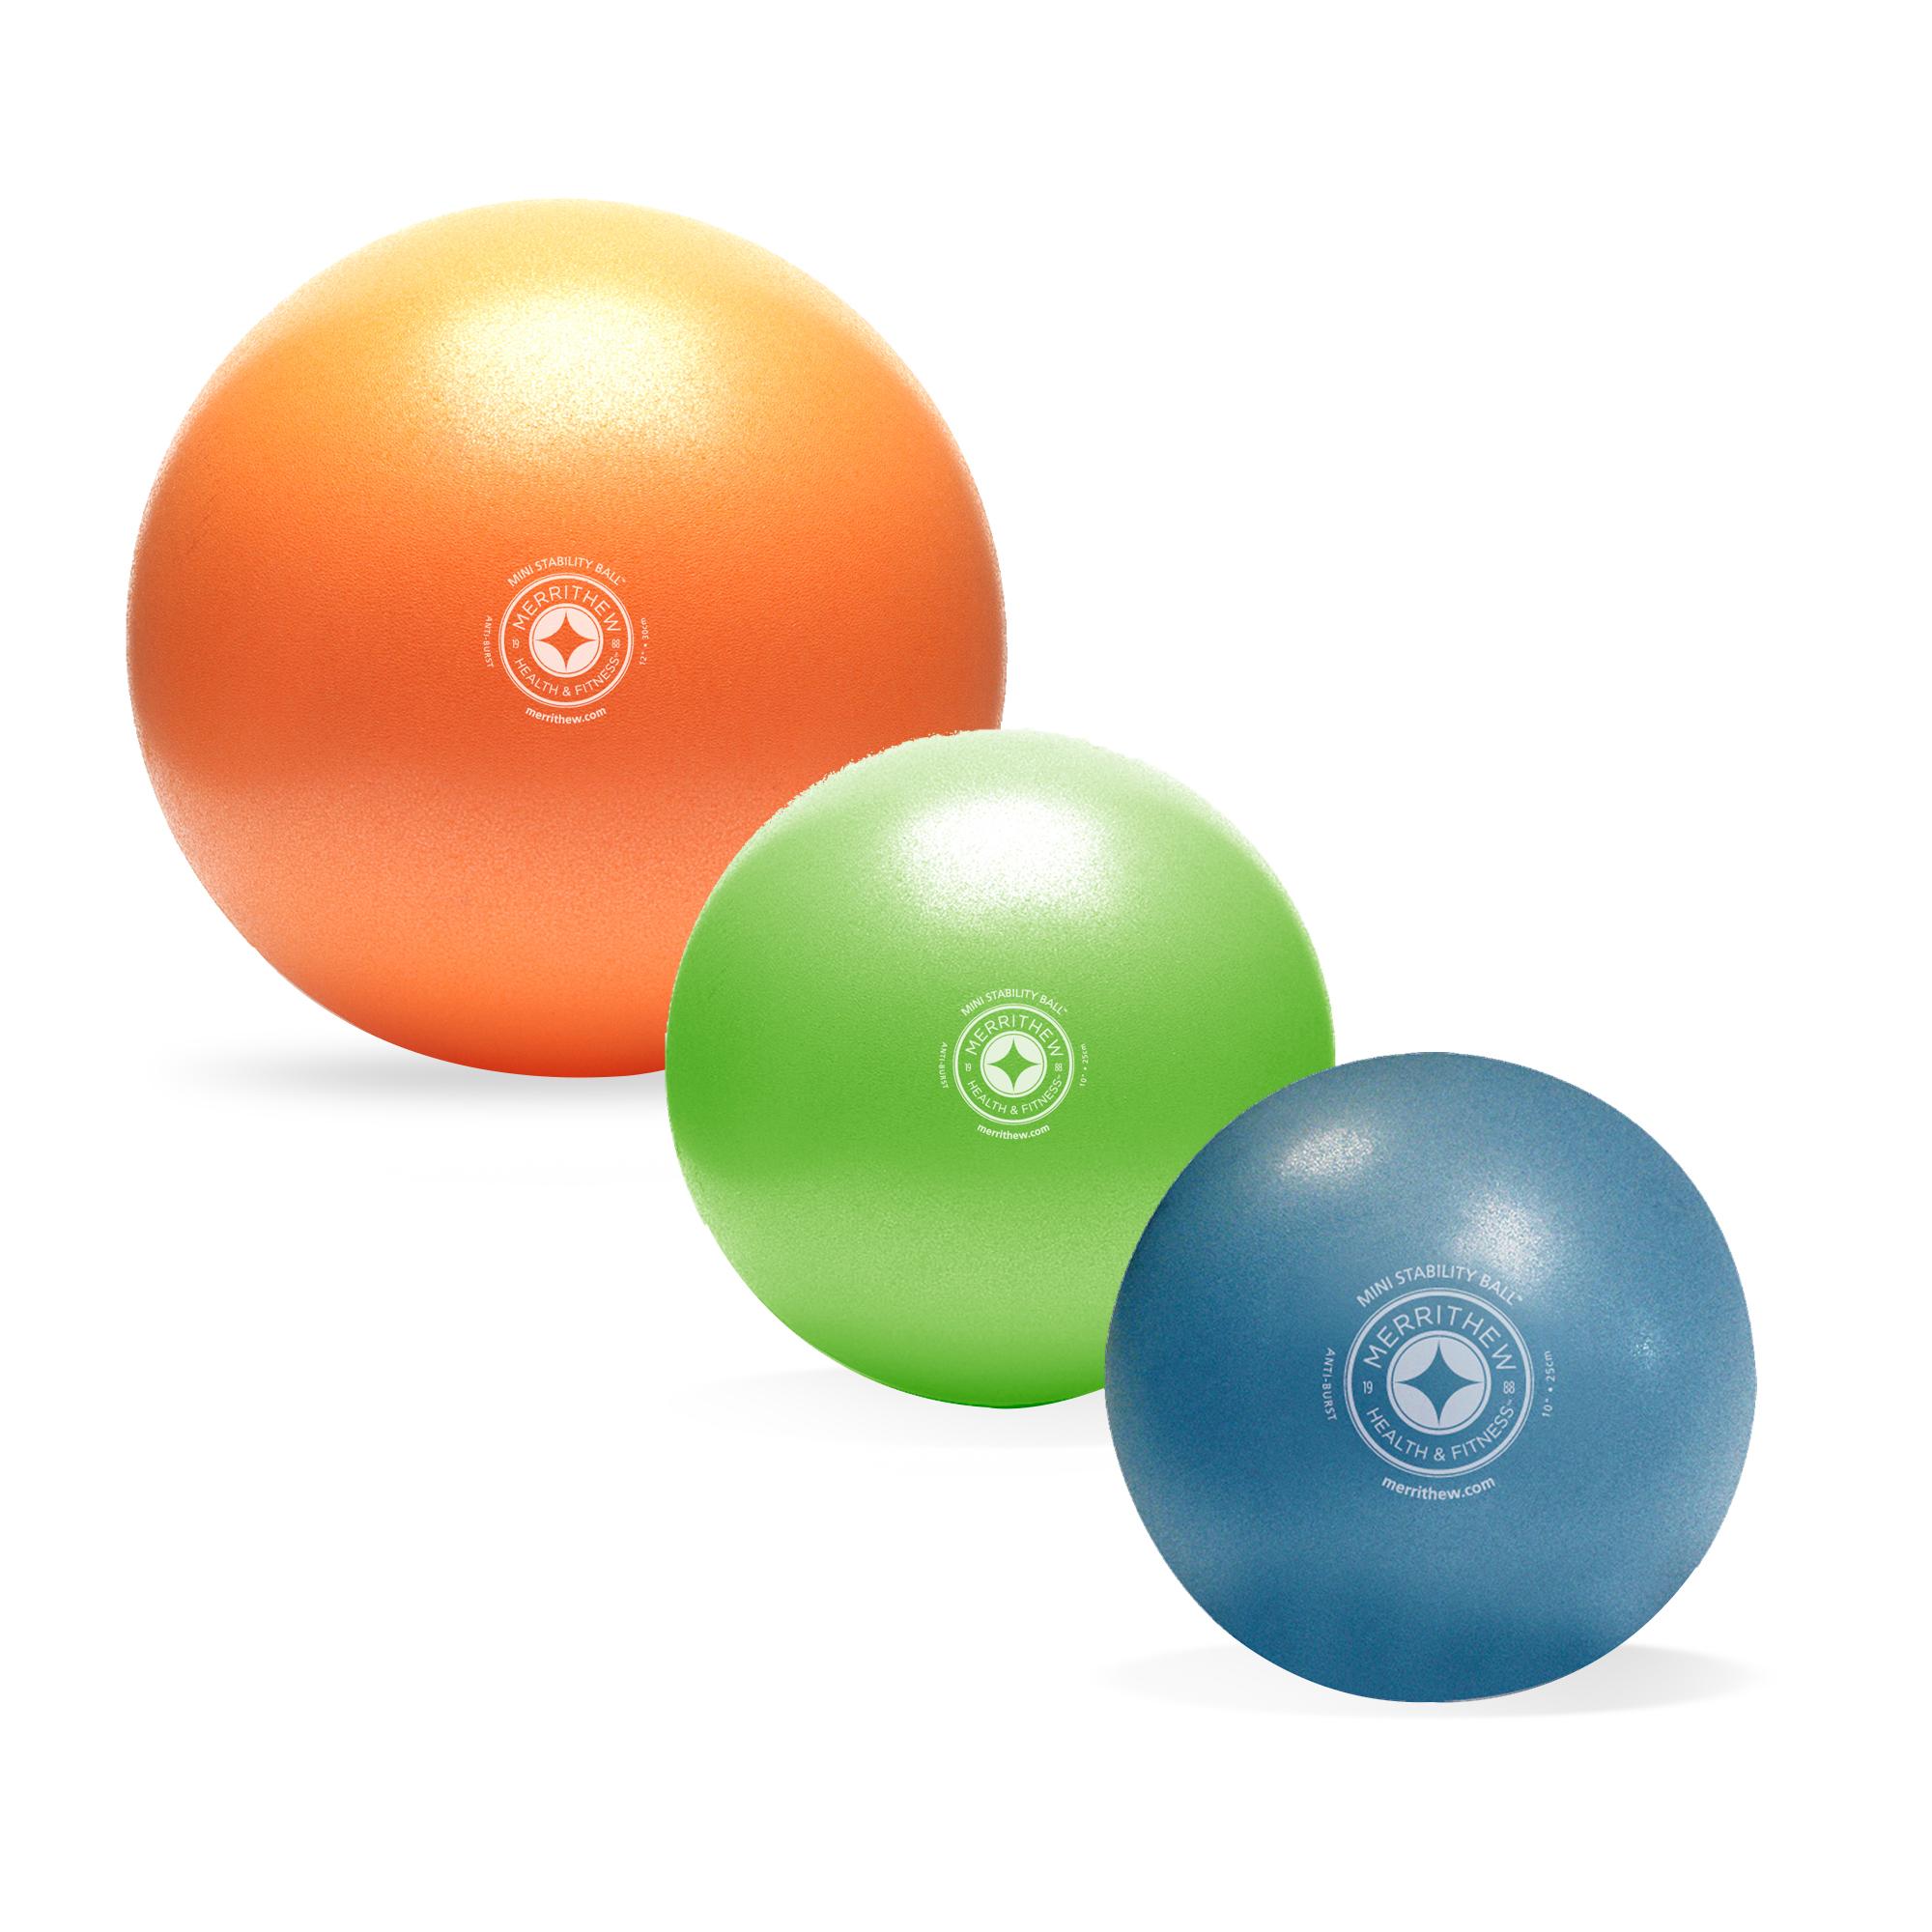 Stott 174 Pilates Mini Stability Balls Shop All Mind Amp Body